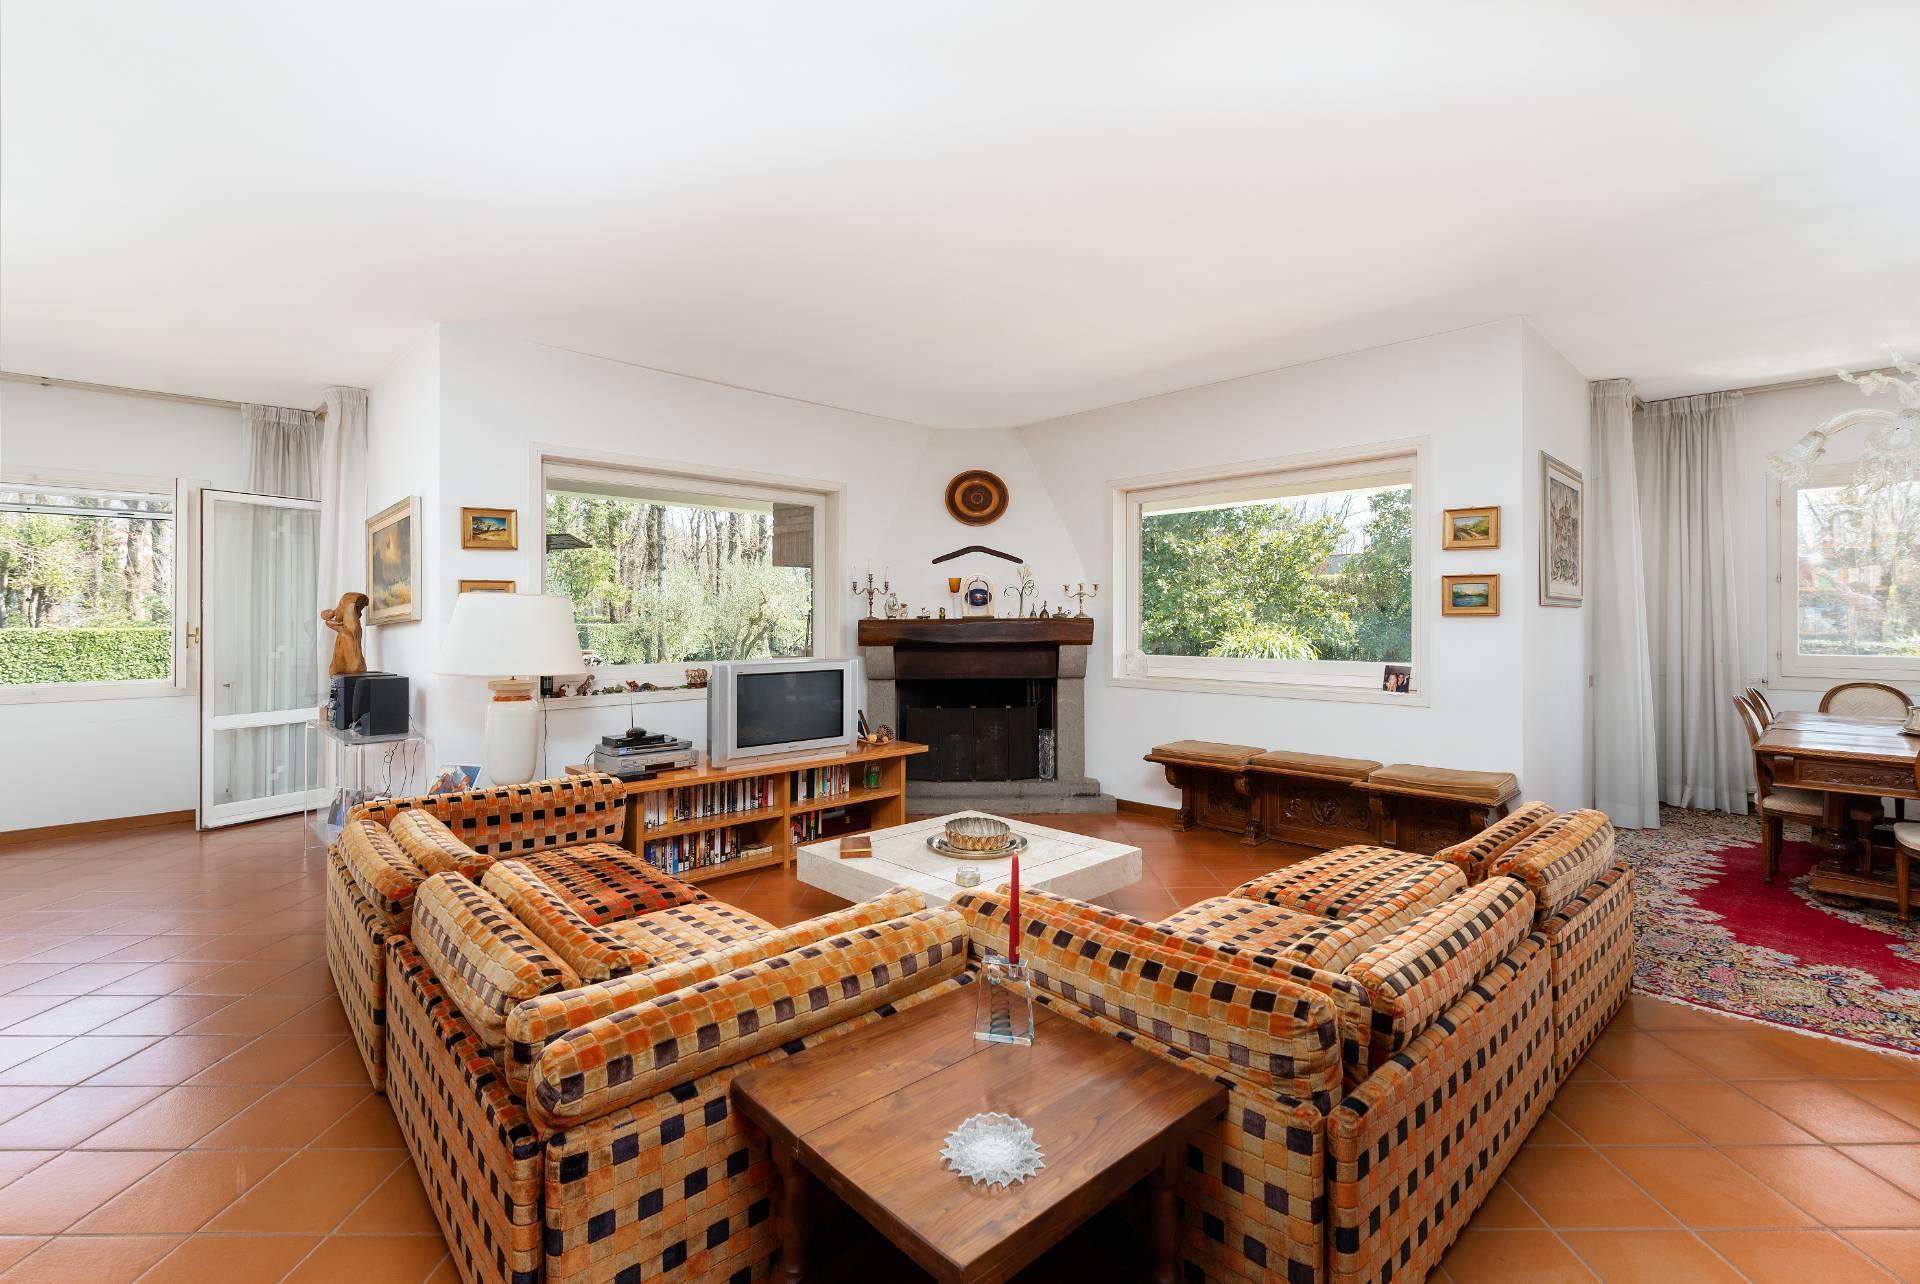 Villa in Vendita a Ariccia: 5 locali, 583 mq - Foto 4